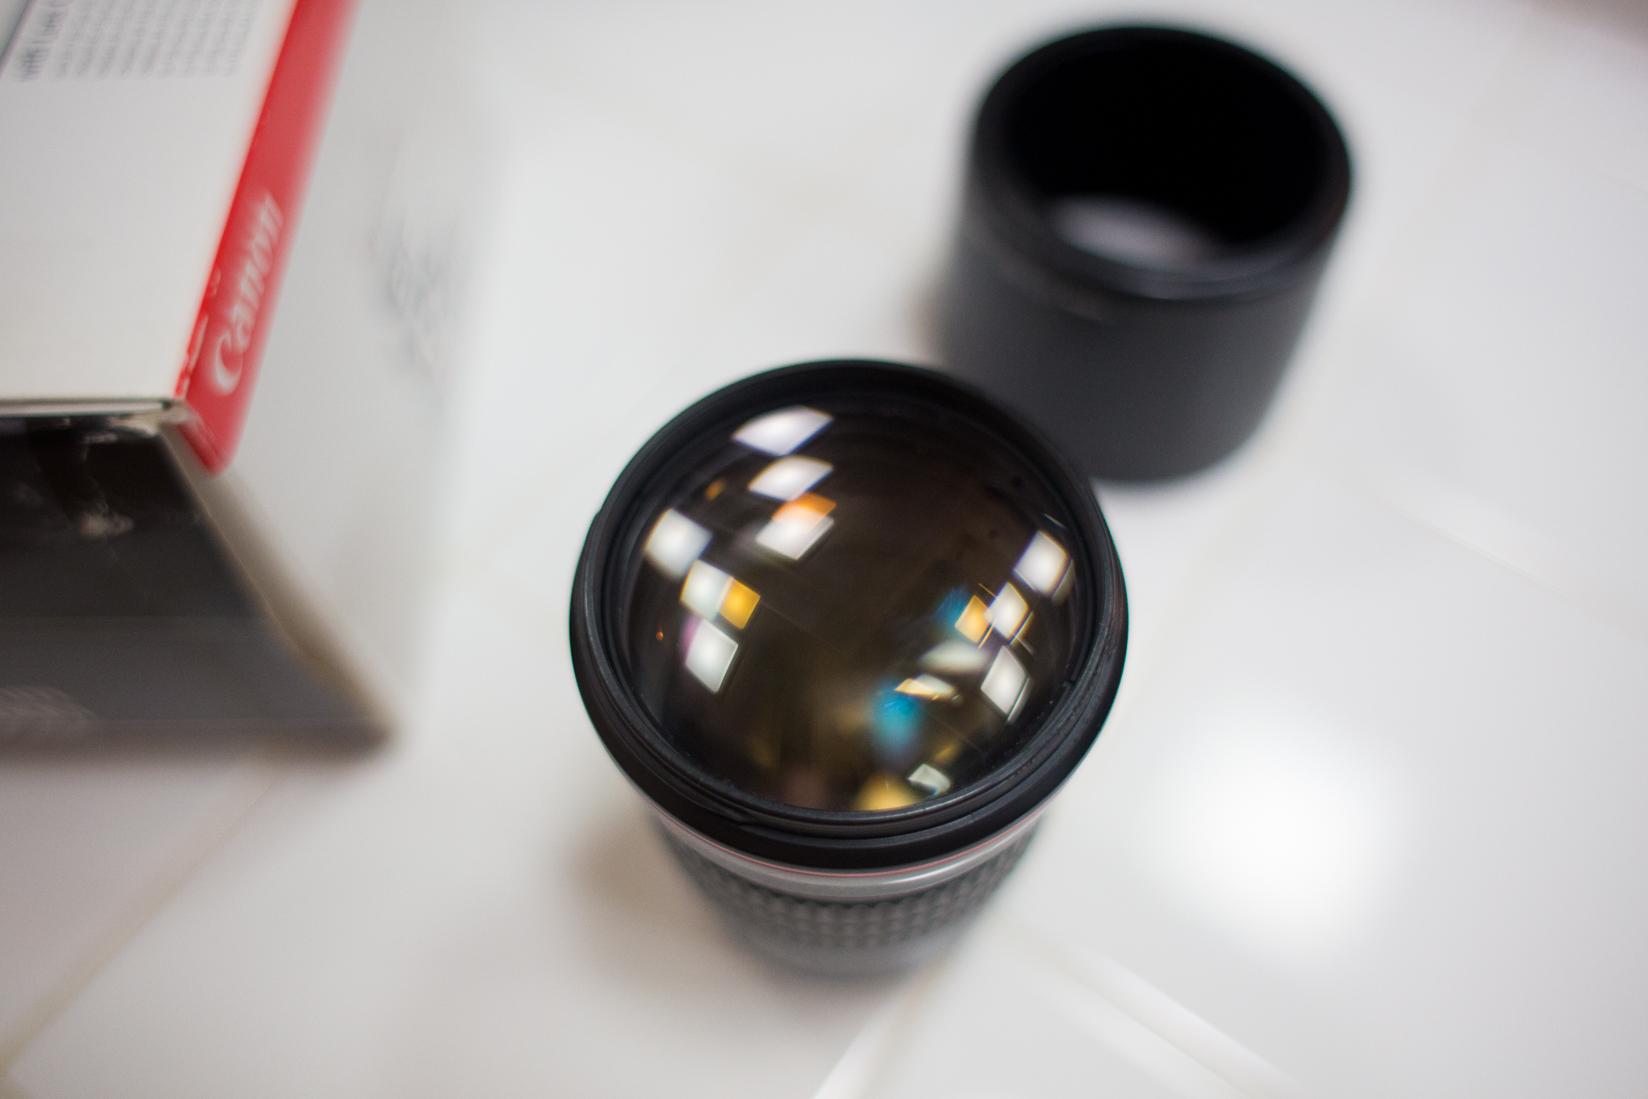 canon-135mm-lens-portrait-photography-bokeh-paulina-splechta-boca-raton-.jpg